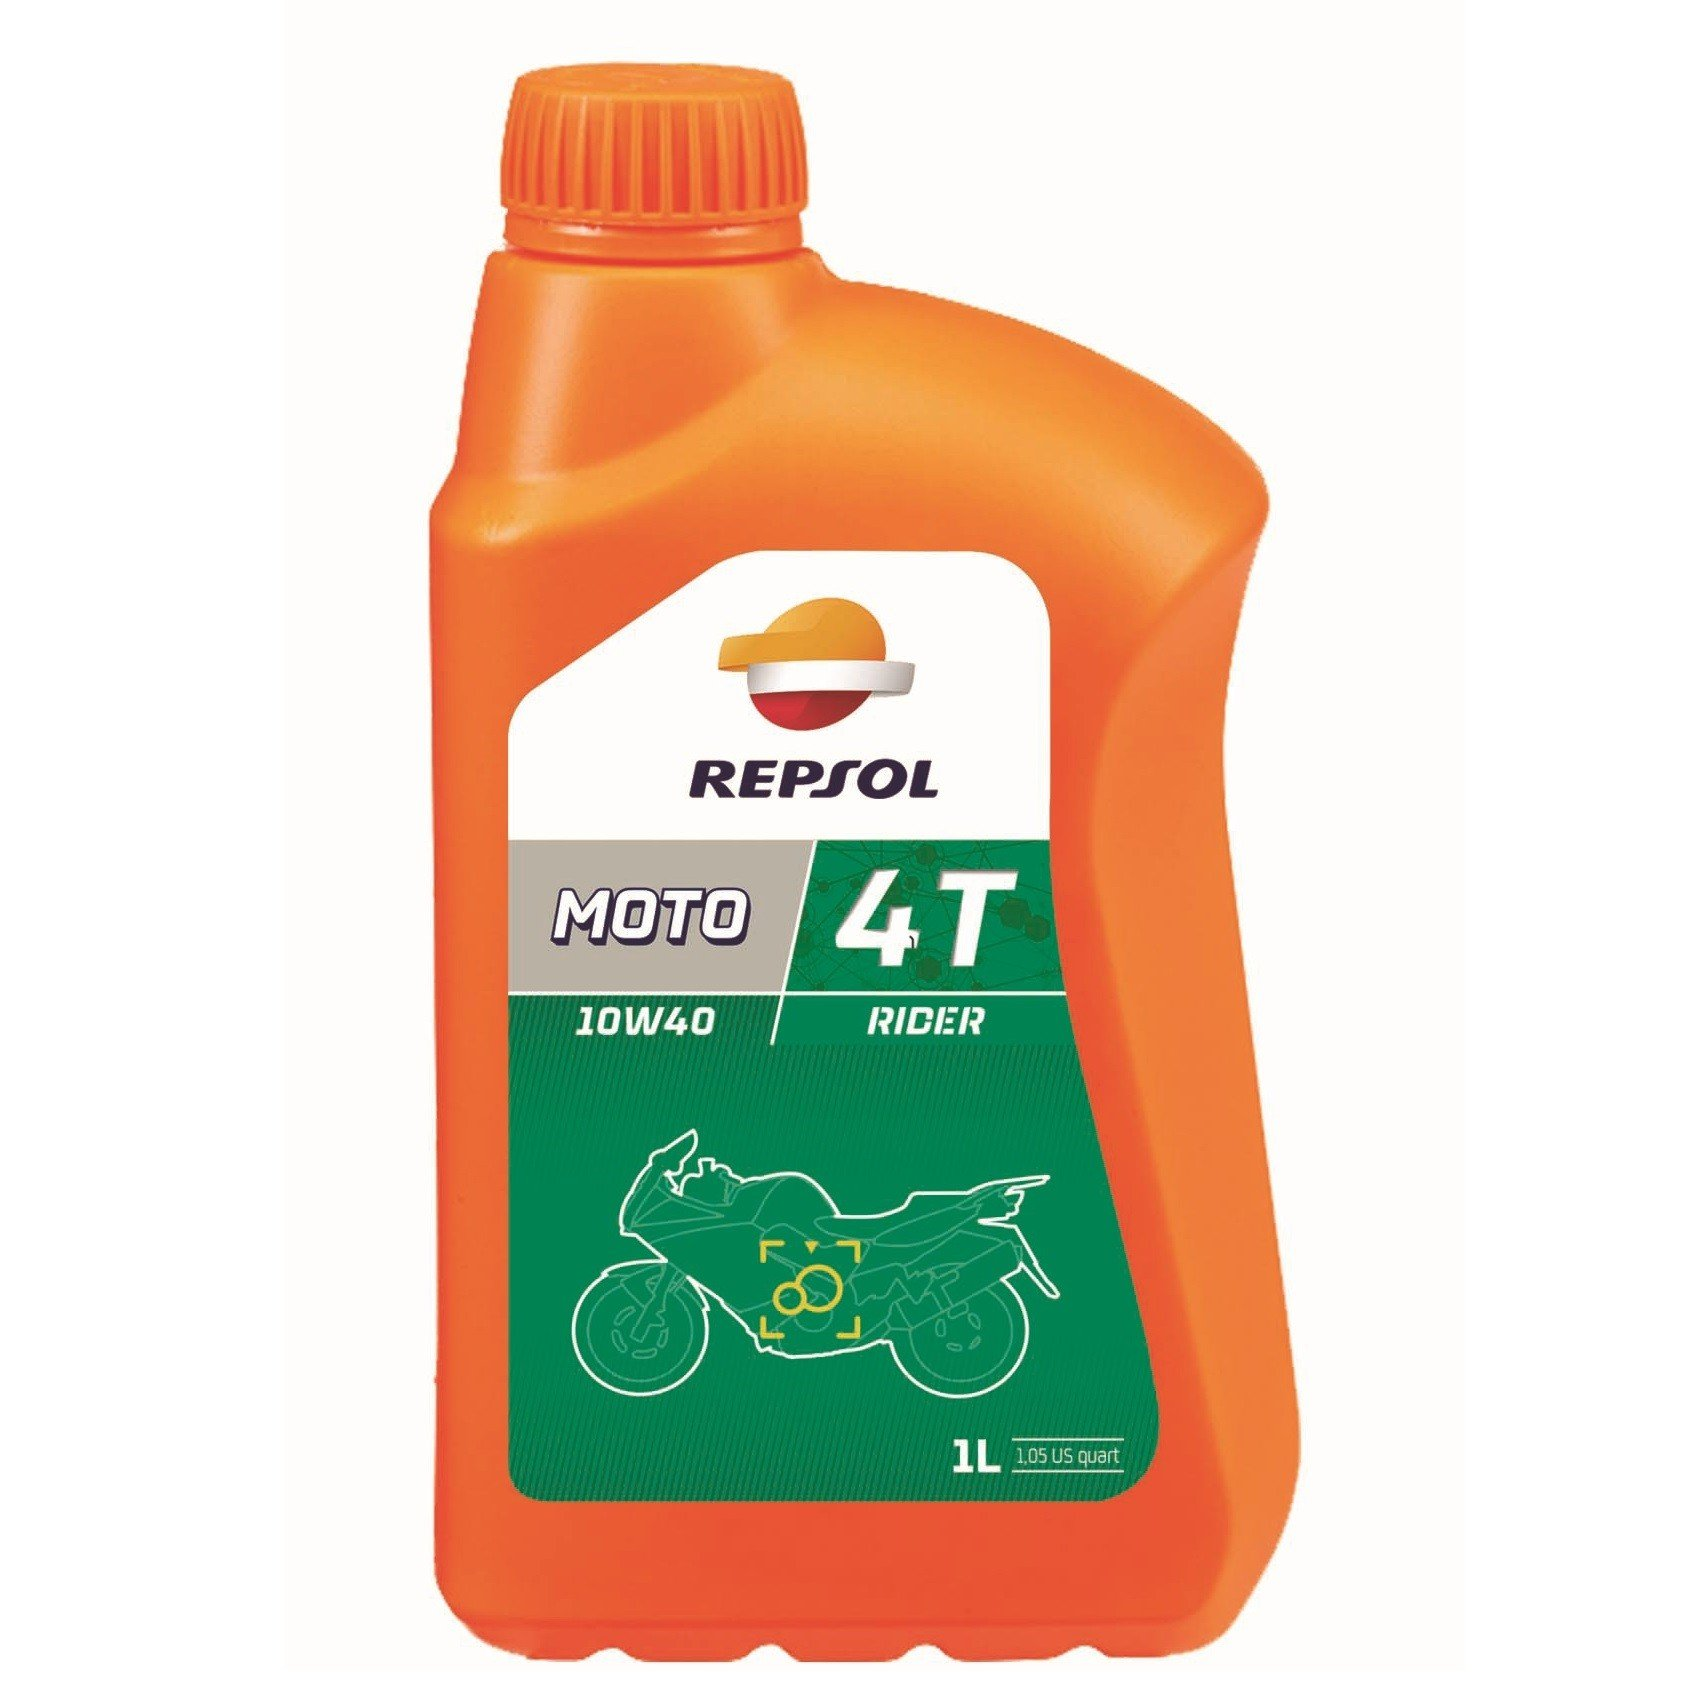 Minerální motorový olej REPSOL Moto Rider 4T 10W40, 1L